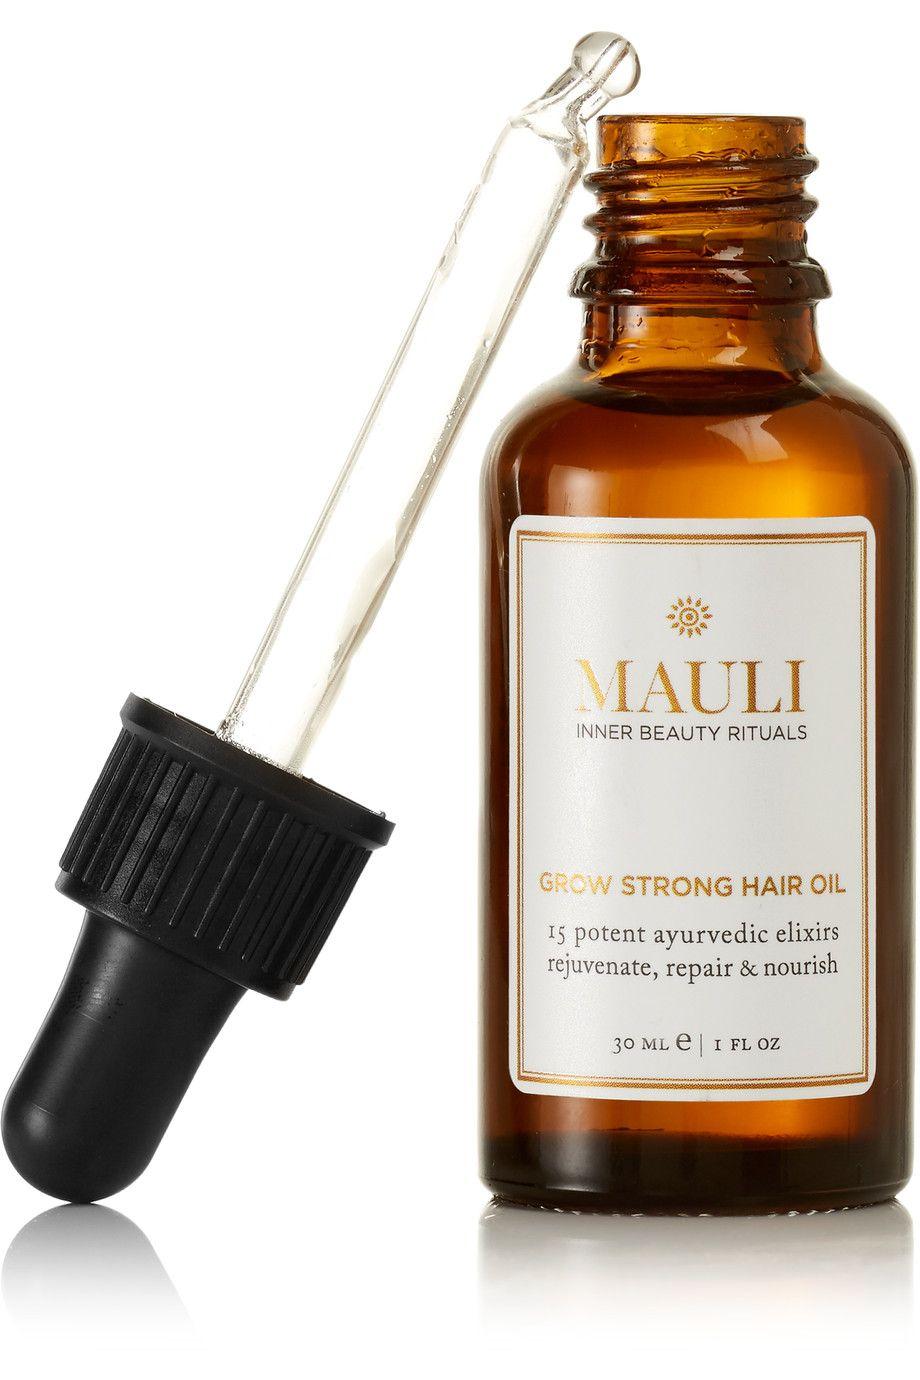 Mauli Rituals' nourishing 'Grow Strong' hair oil contains